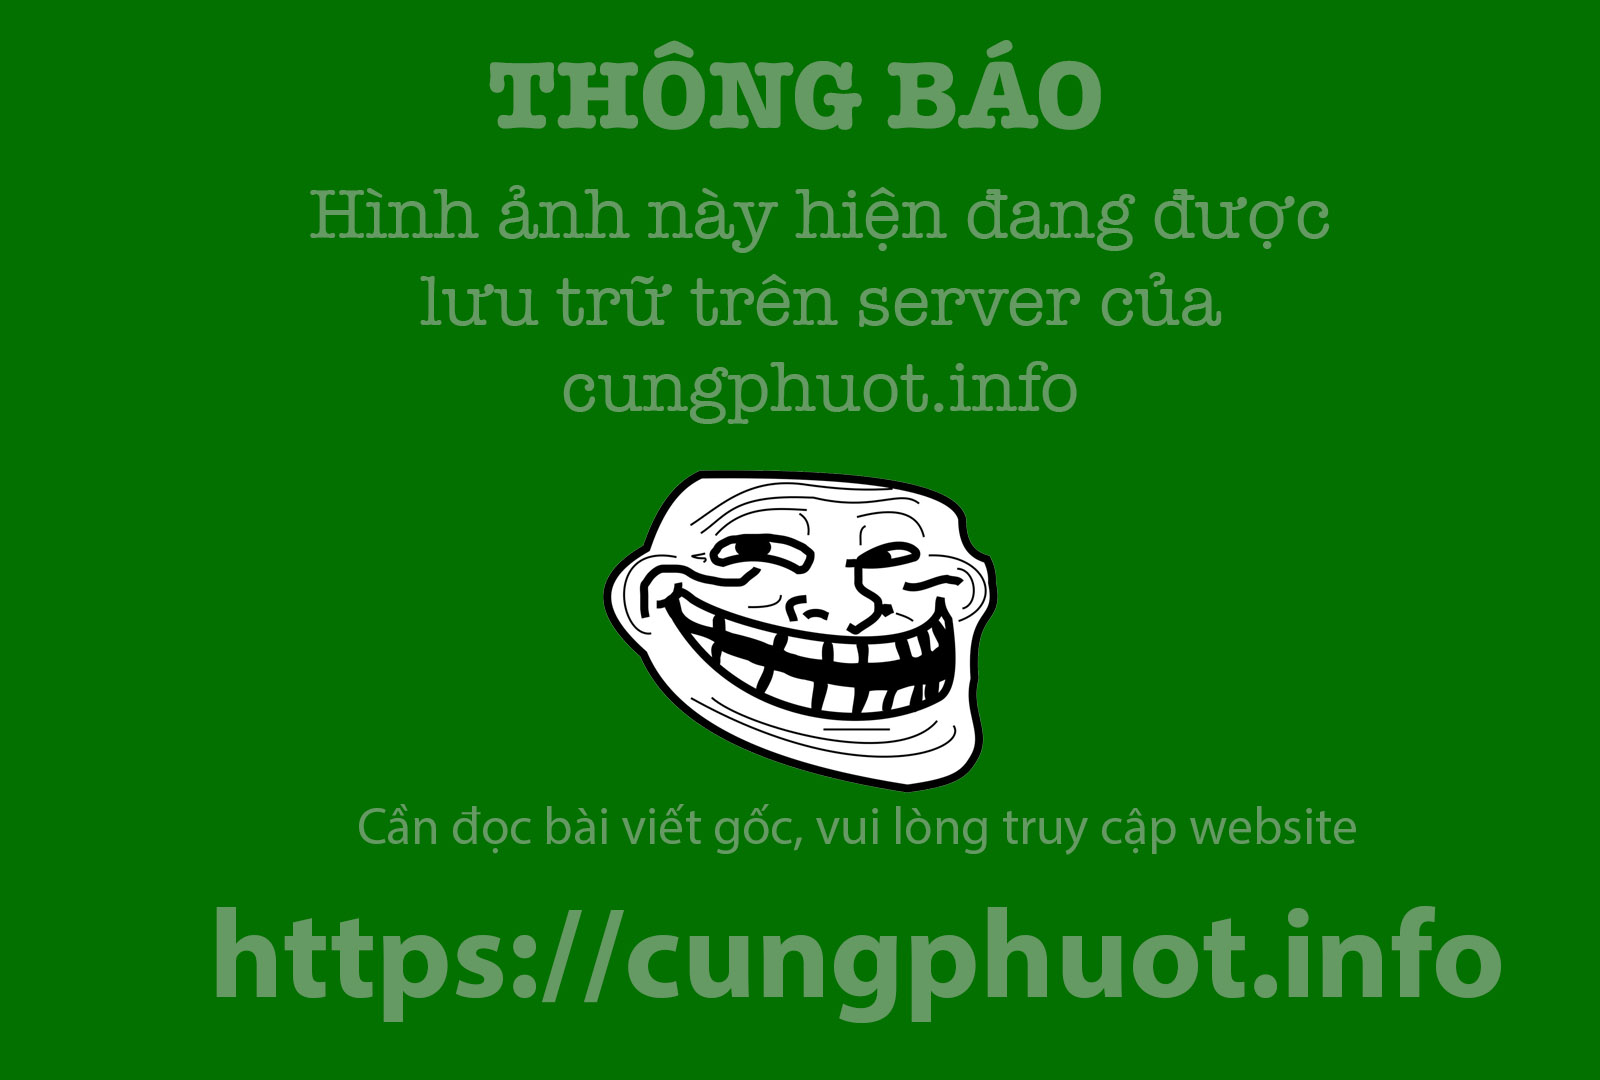 Den Moc Chau san mai anh dao hinh anh 10